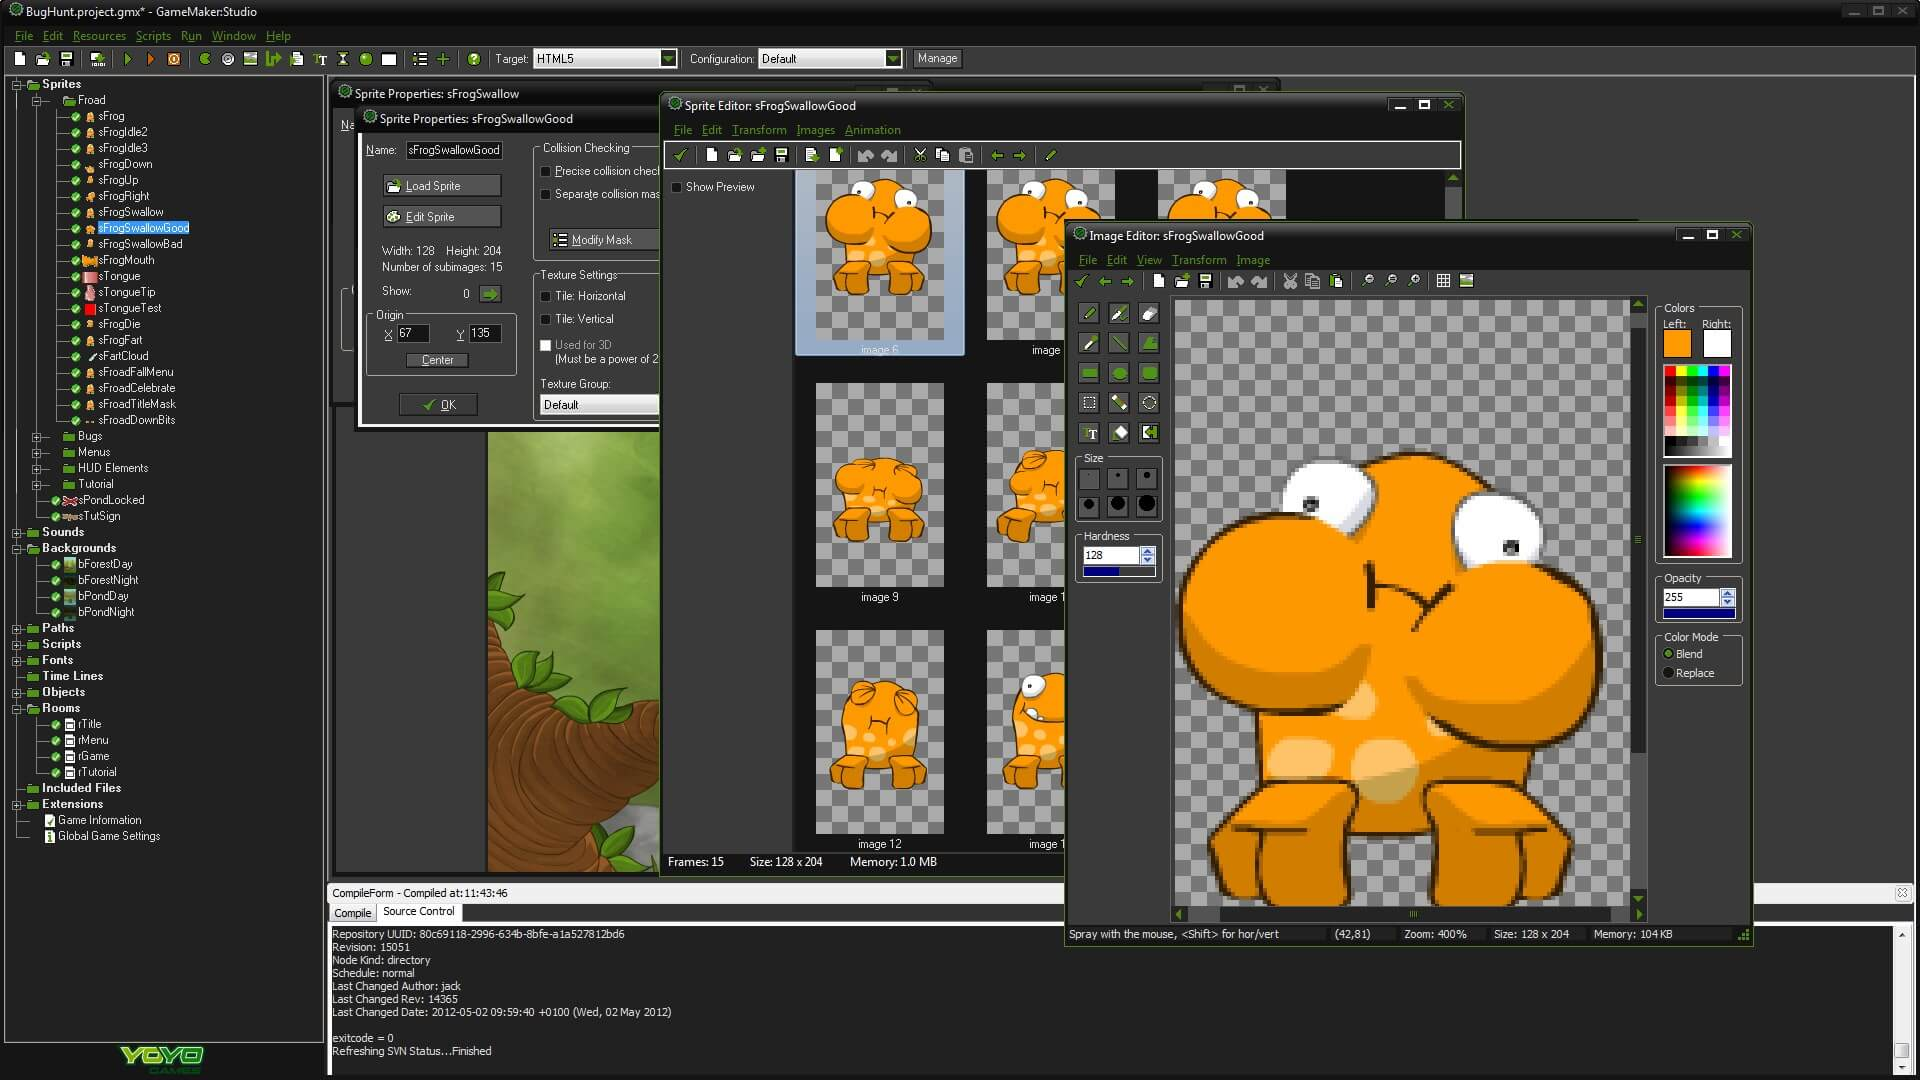 gamemaker studio 2 screenshot